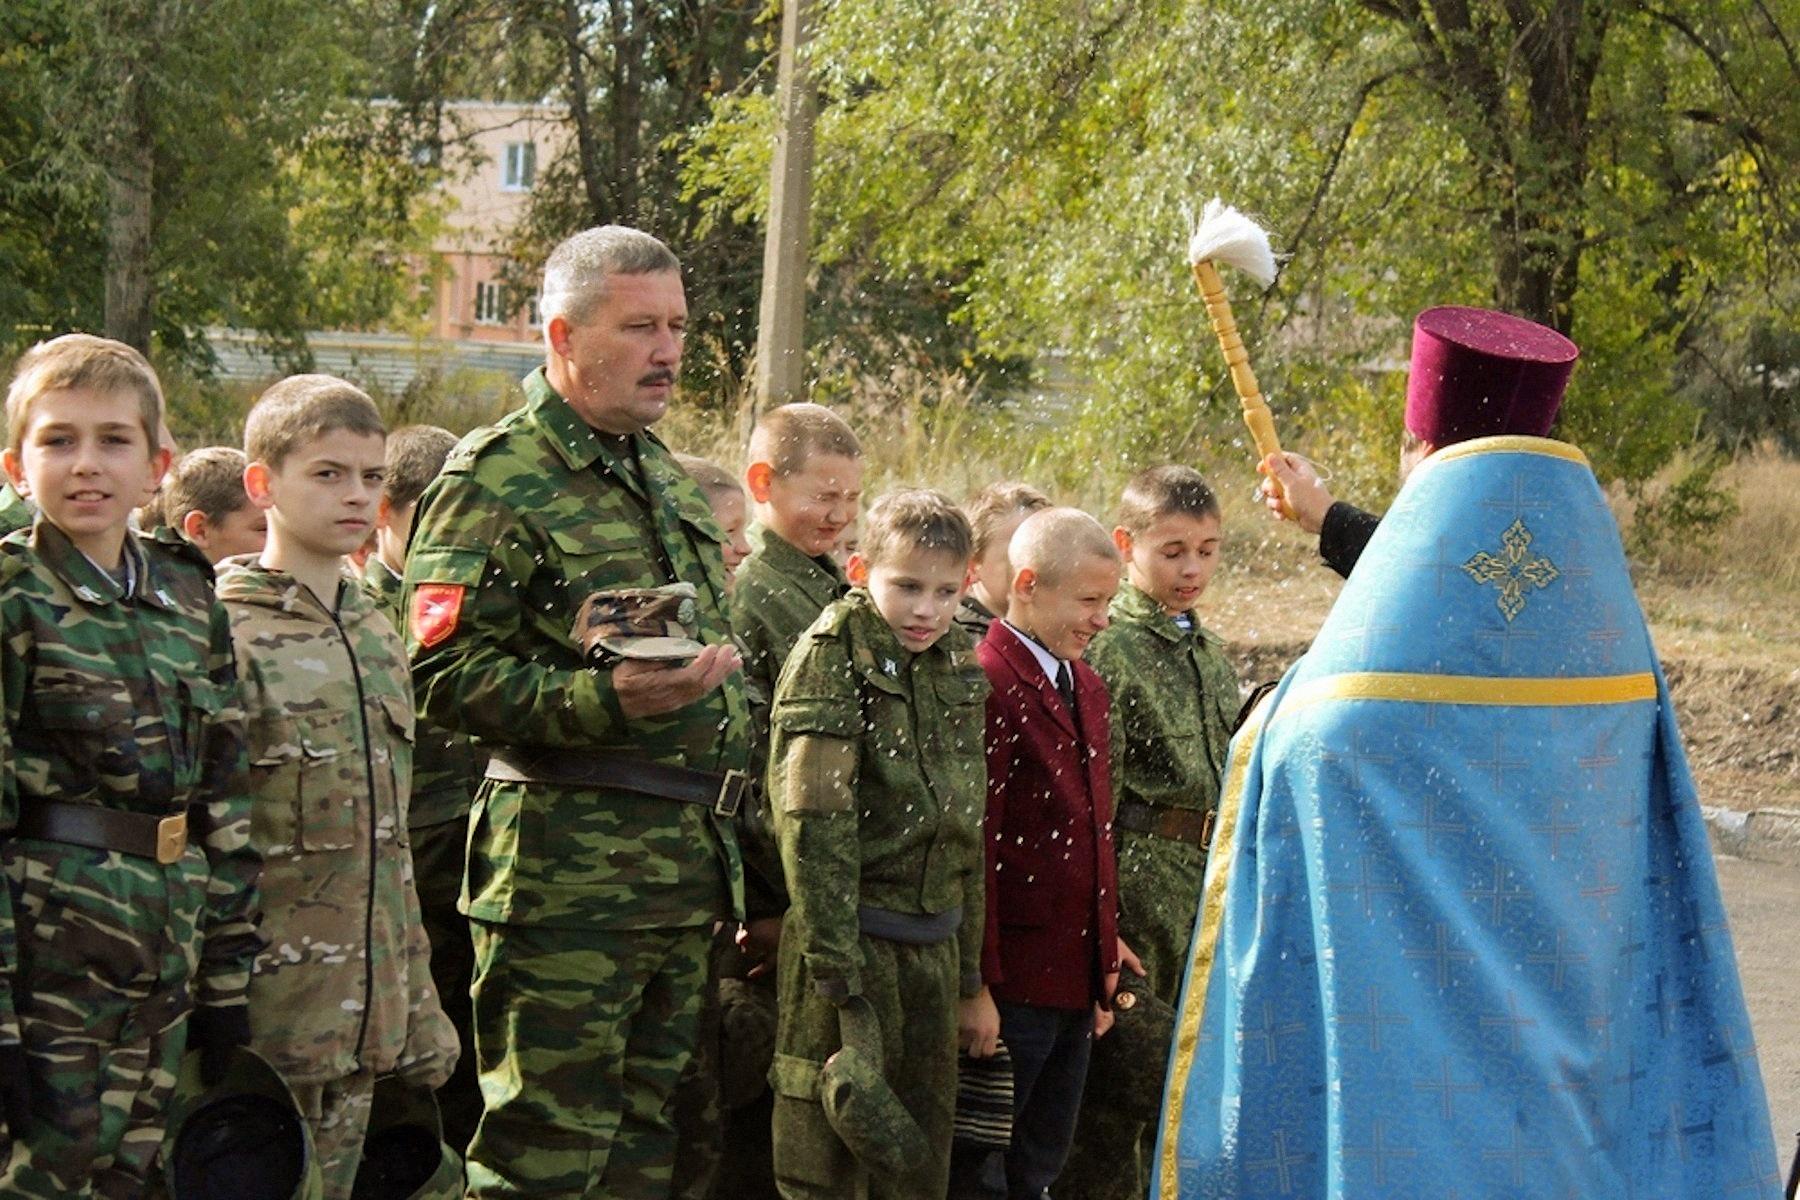 00 lugansk pr lnr cossack cadet corps 02 191015